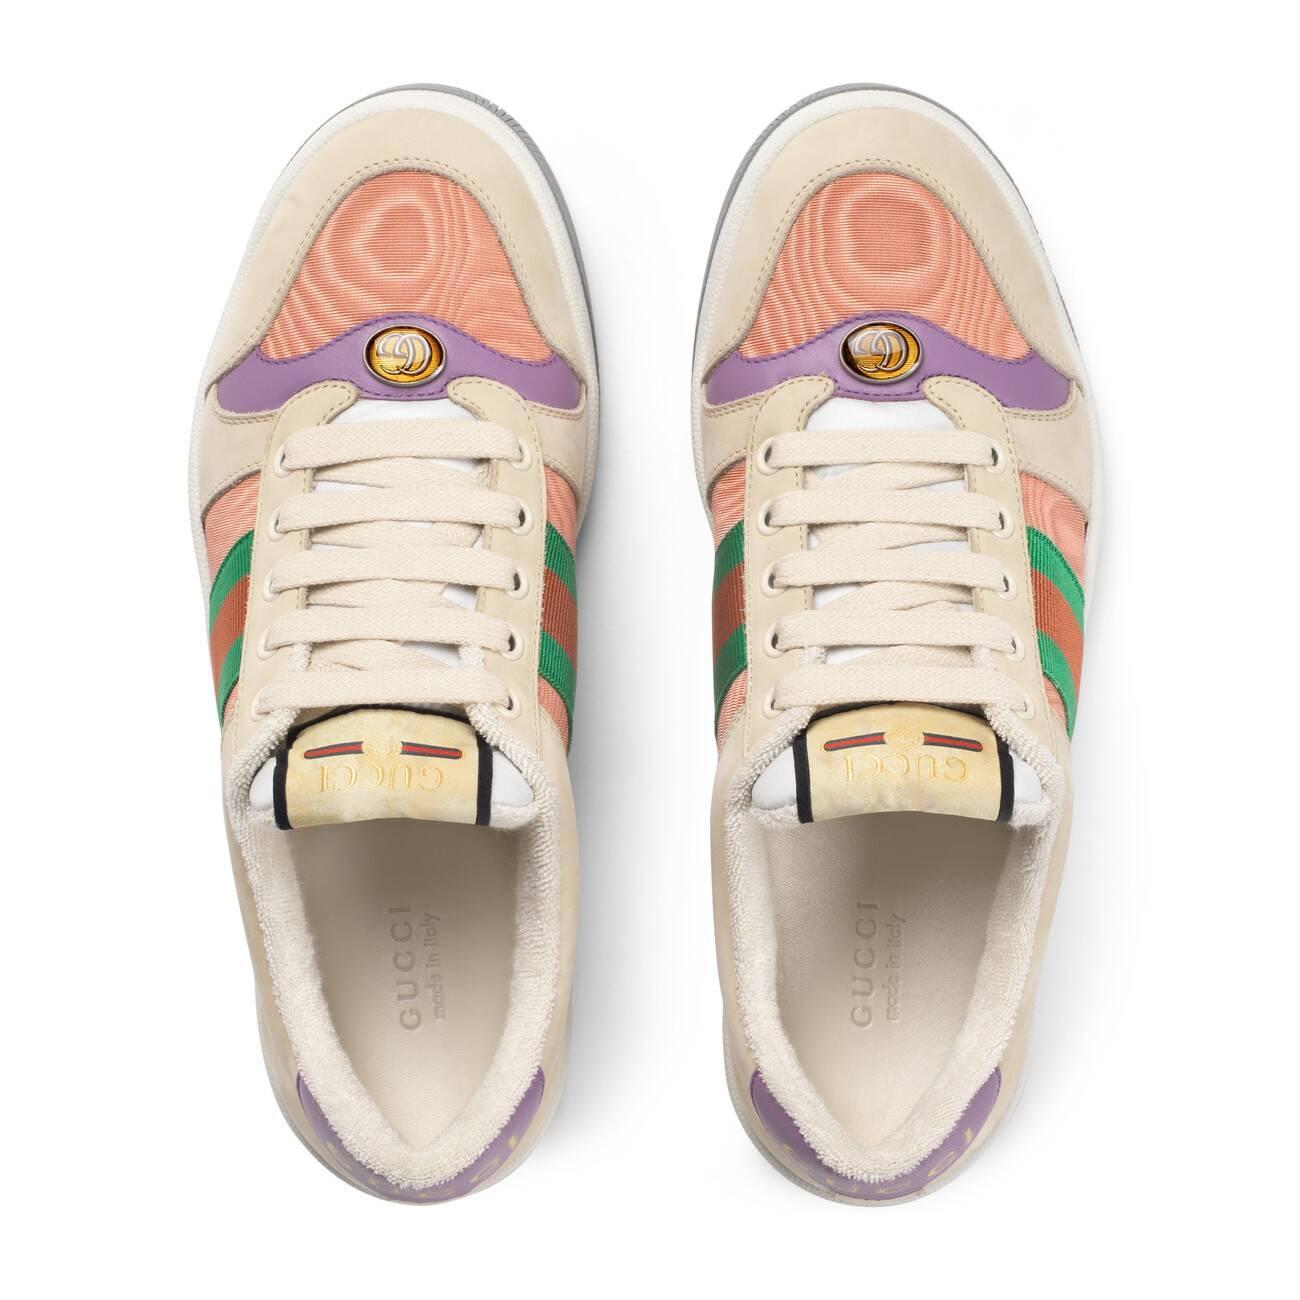 Gucci Women's Screener Leather Sneaker